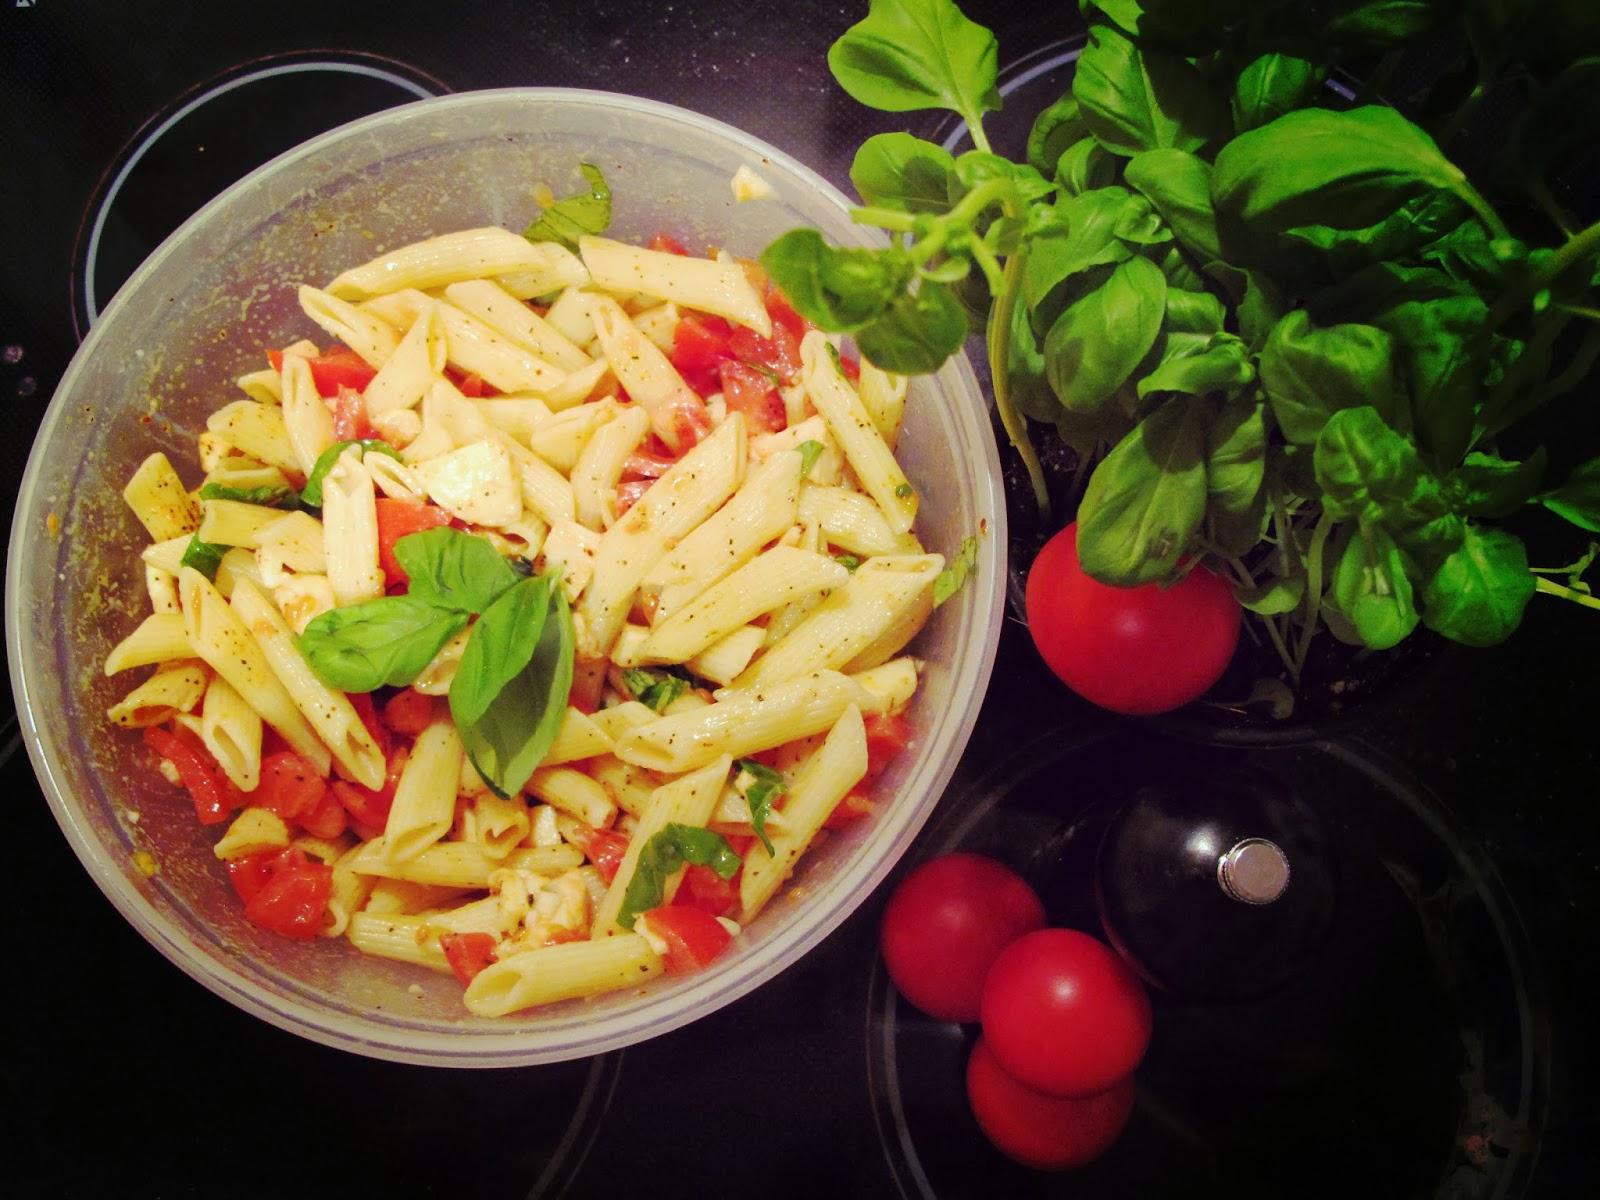 rezept nudel tomate mozzarella salat bluetenschimmern. Black Bedroom Furniture Sets. Home Design Ideas